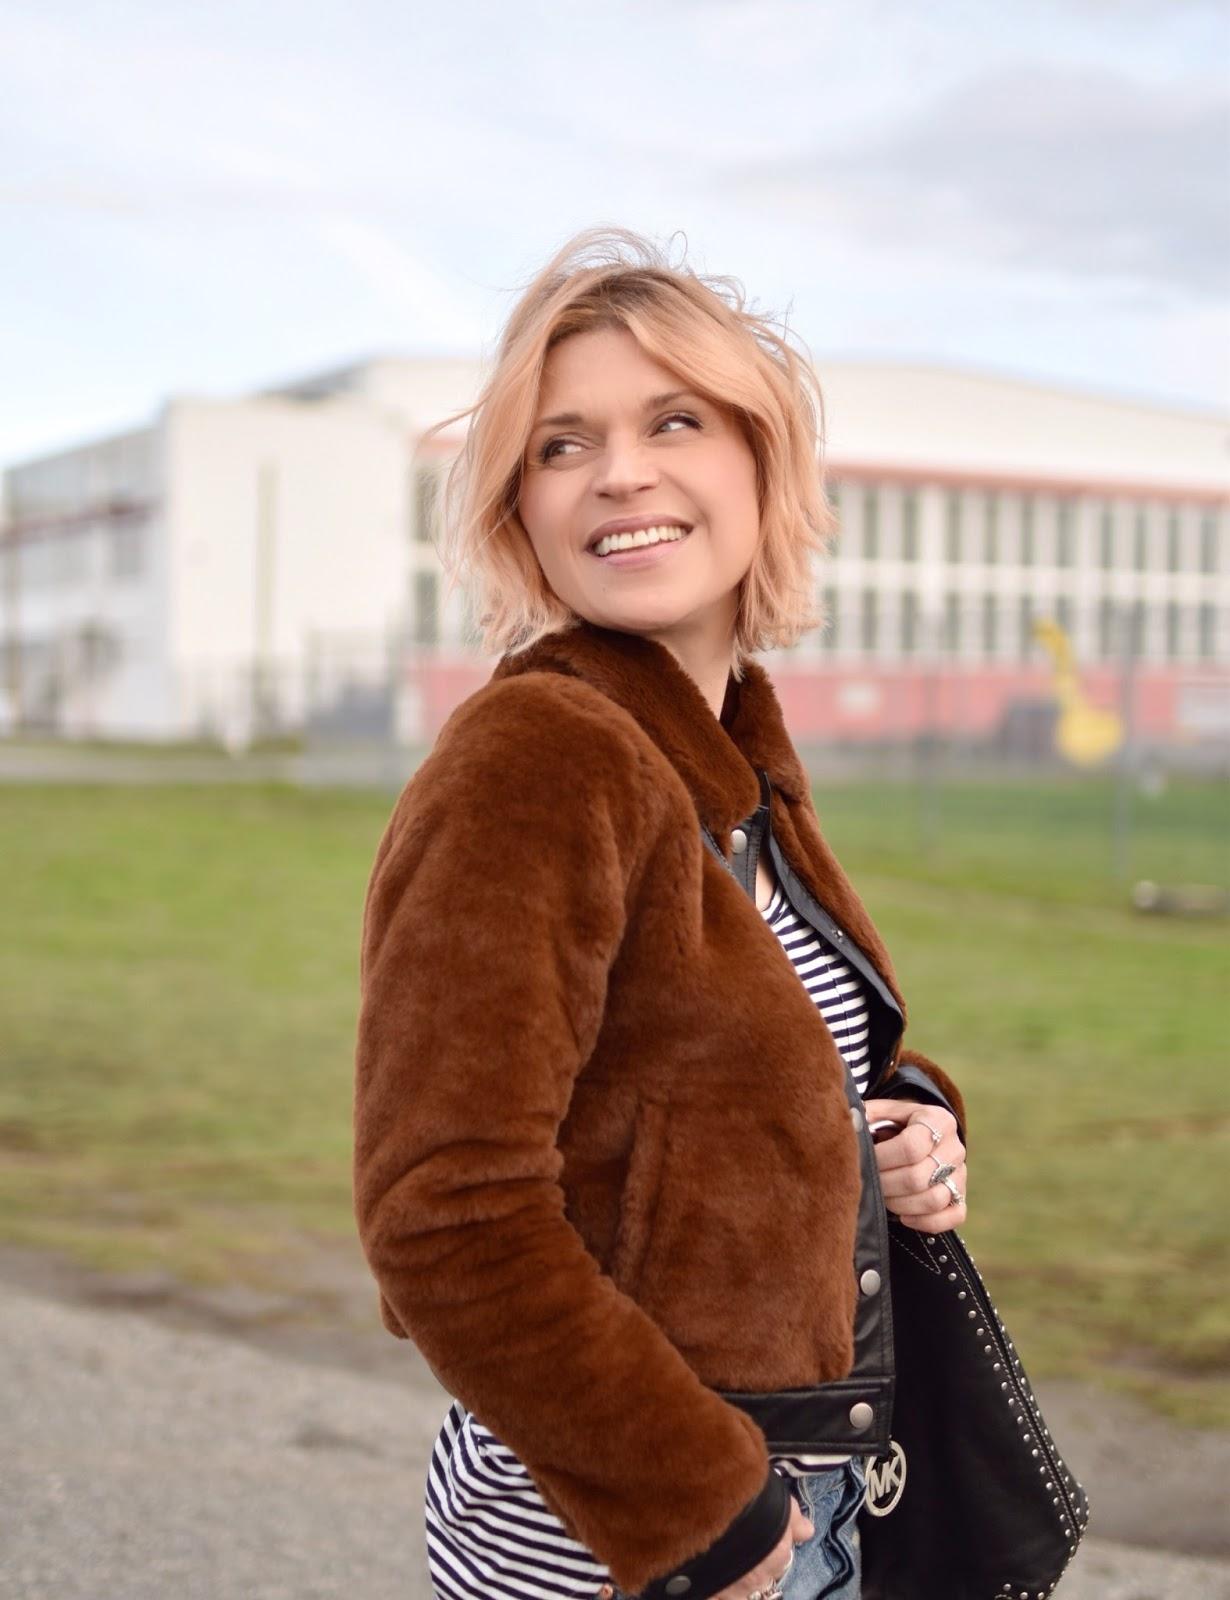 Monika Faulkner outfit inspiration - faux-fur bomber, striped tee